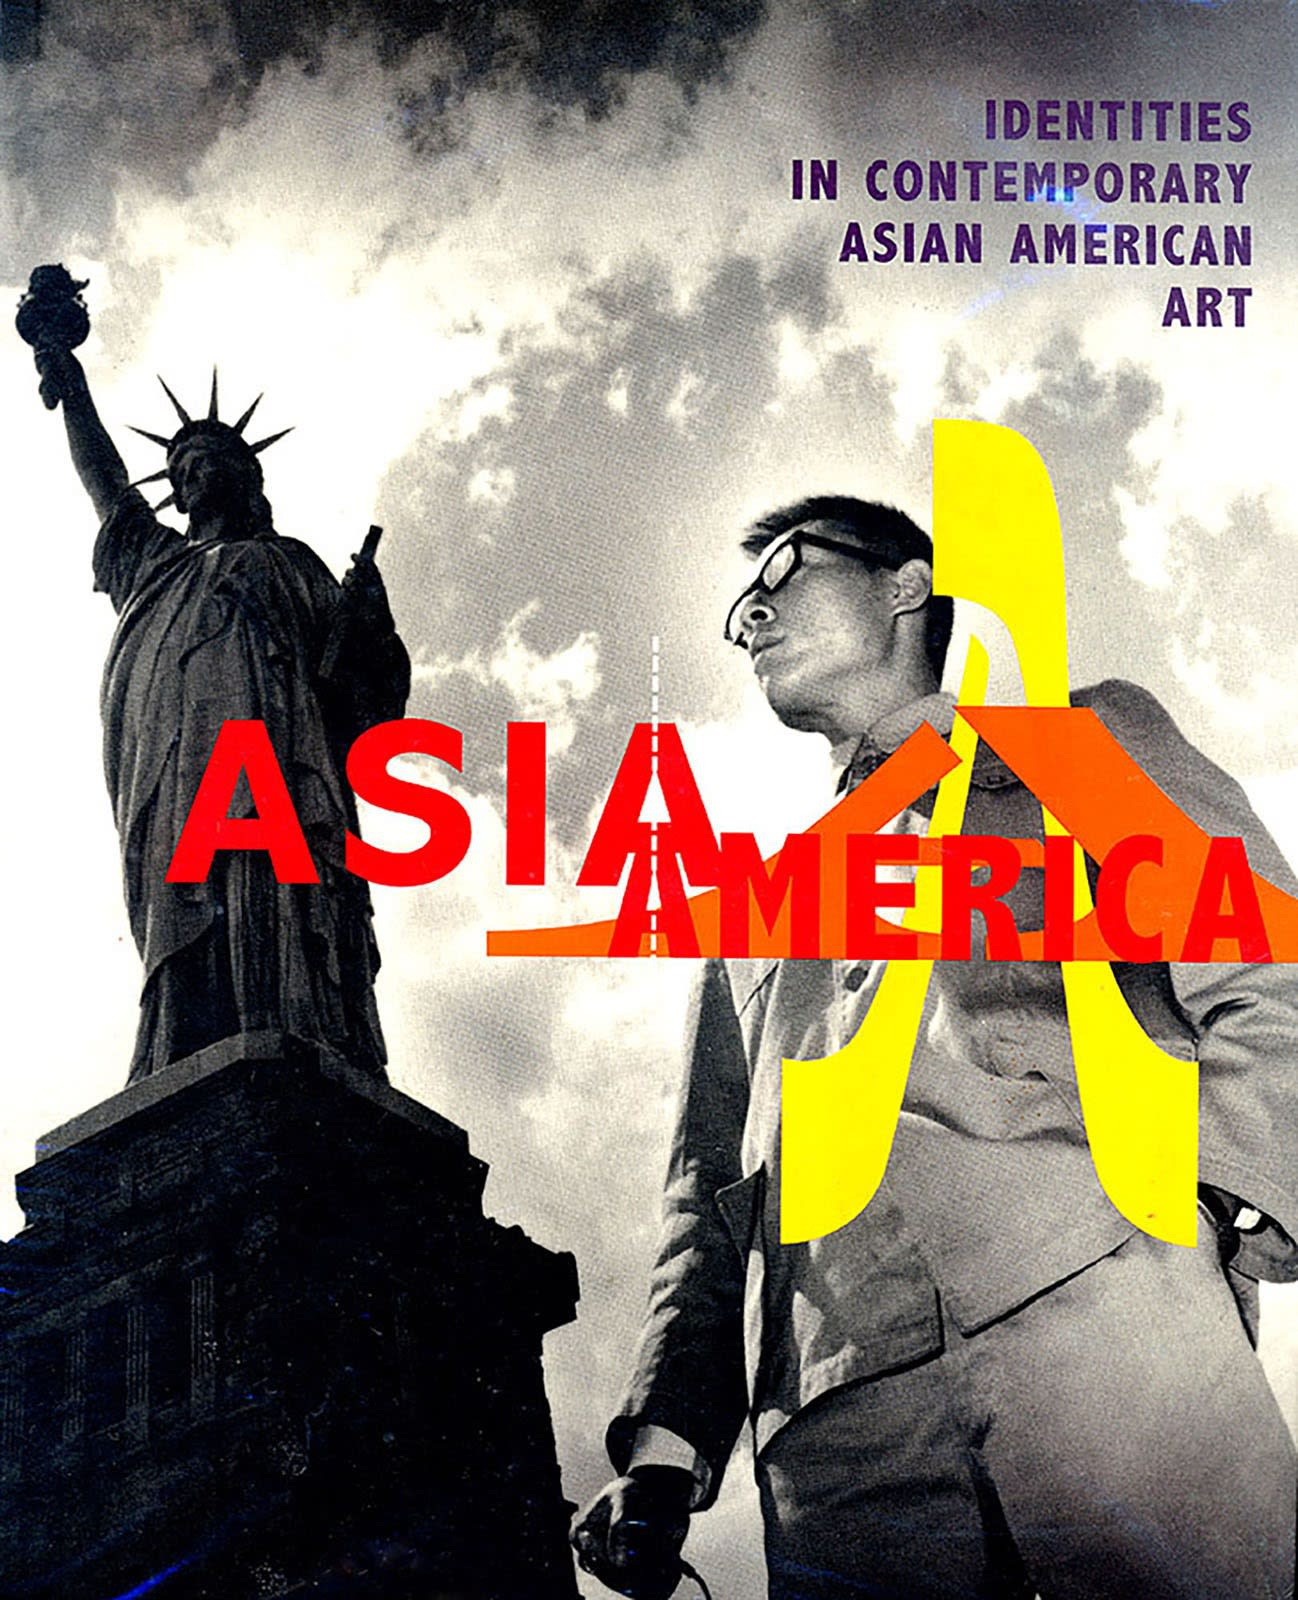 Asia/America: Identities in Contemporary Asian American Art